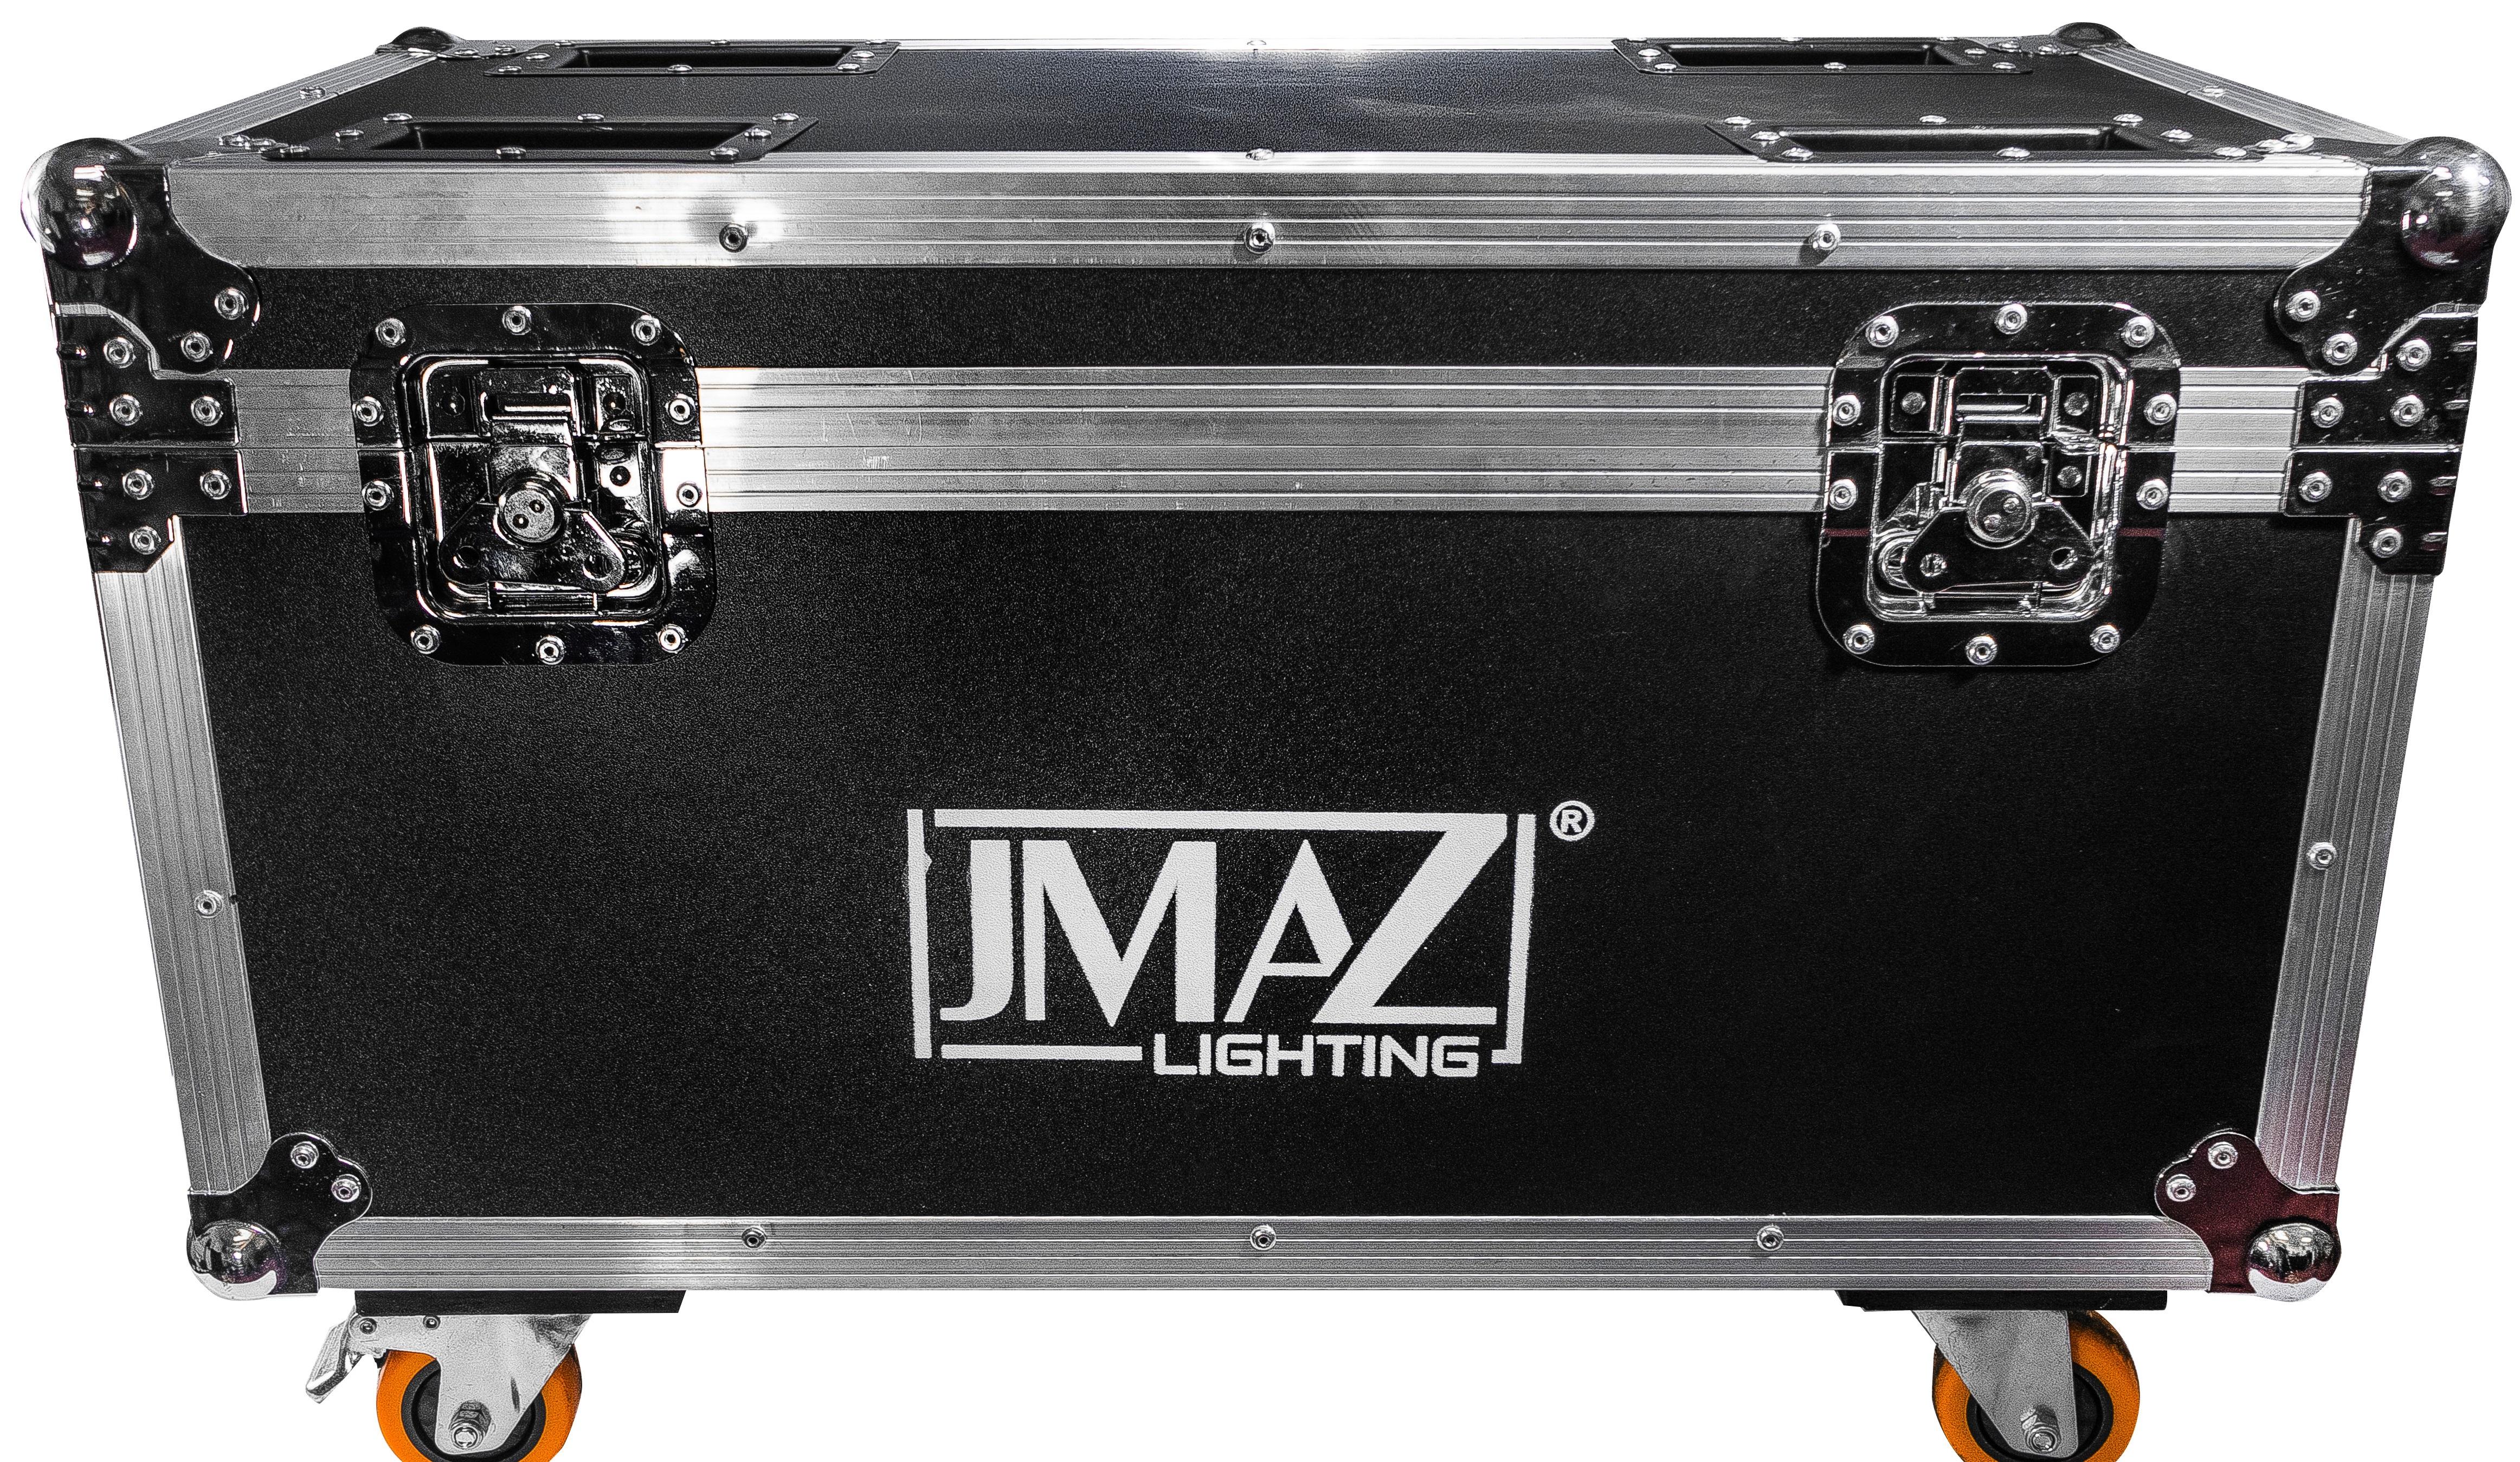 jmaz-4-unit-road-case-crazy-beam-40-fusion.jpeg